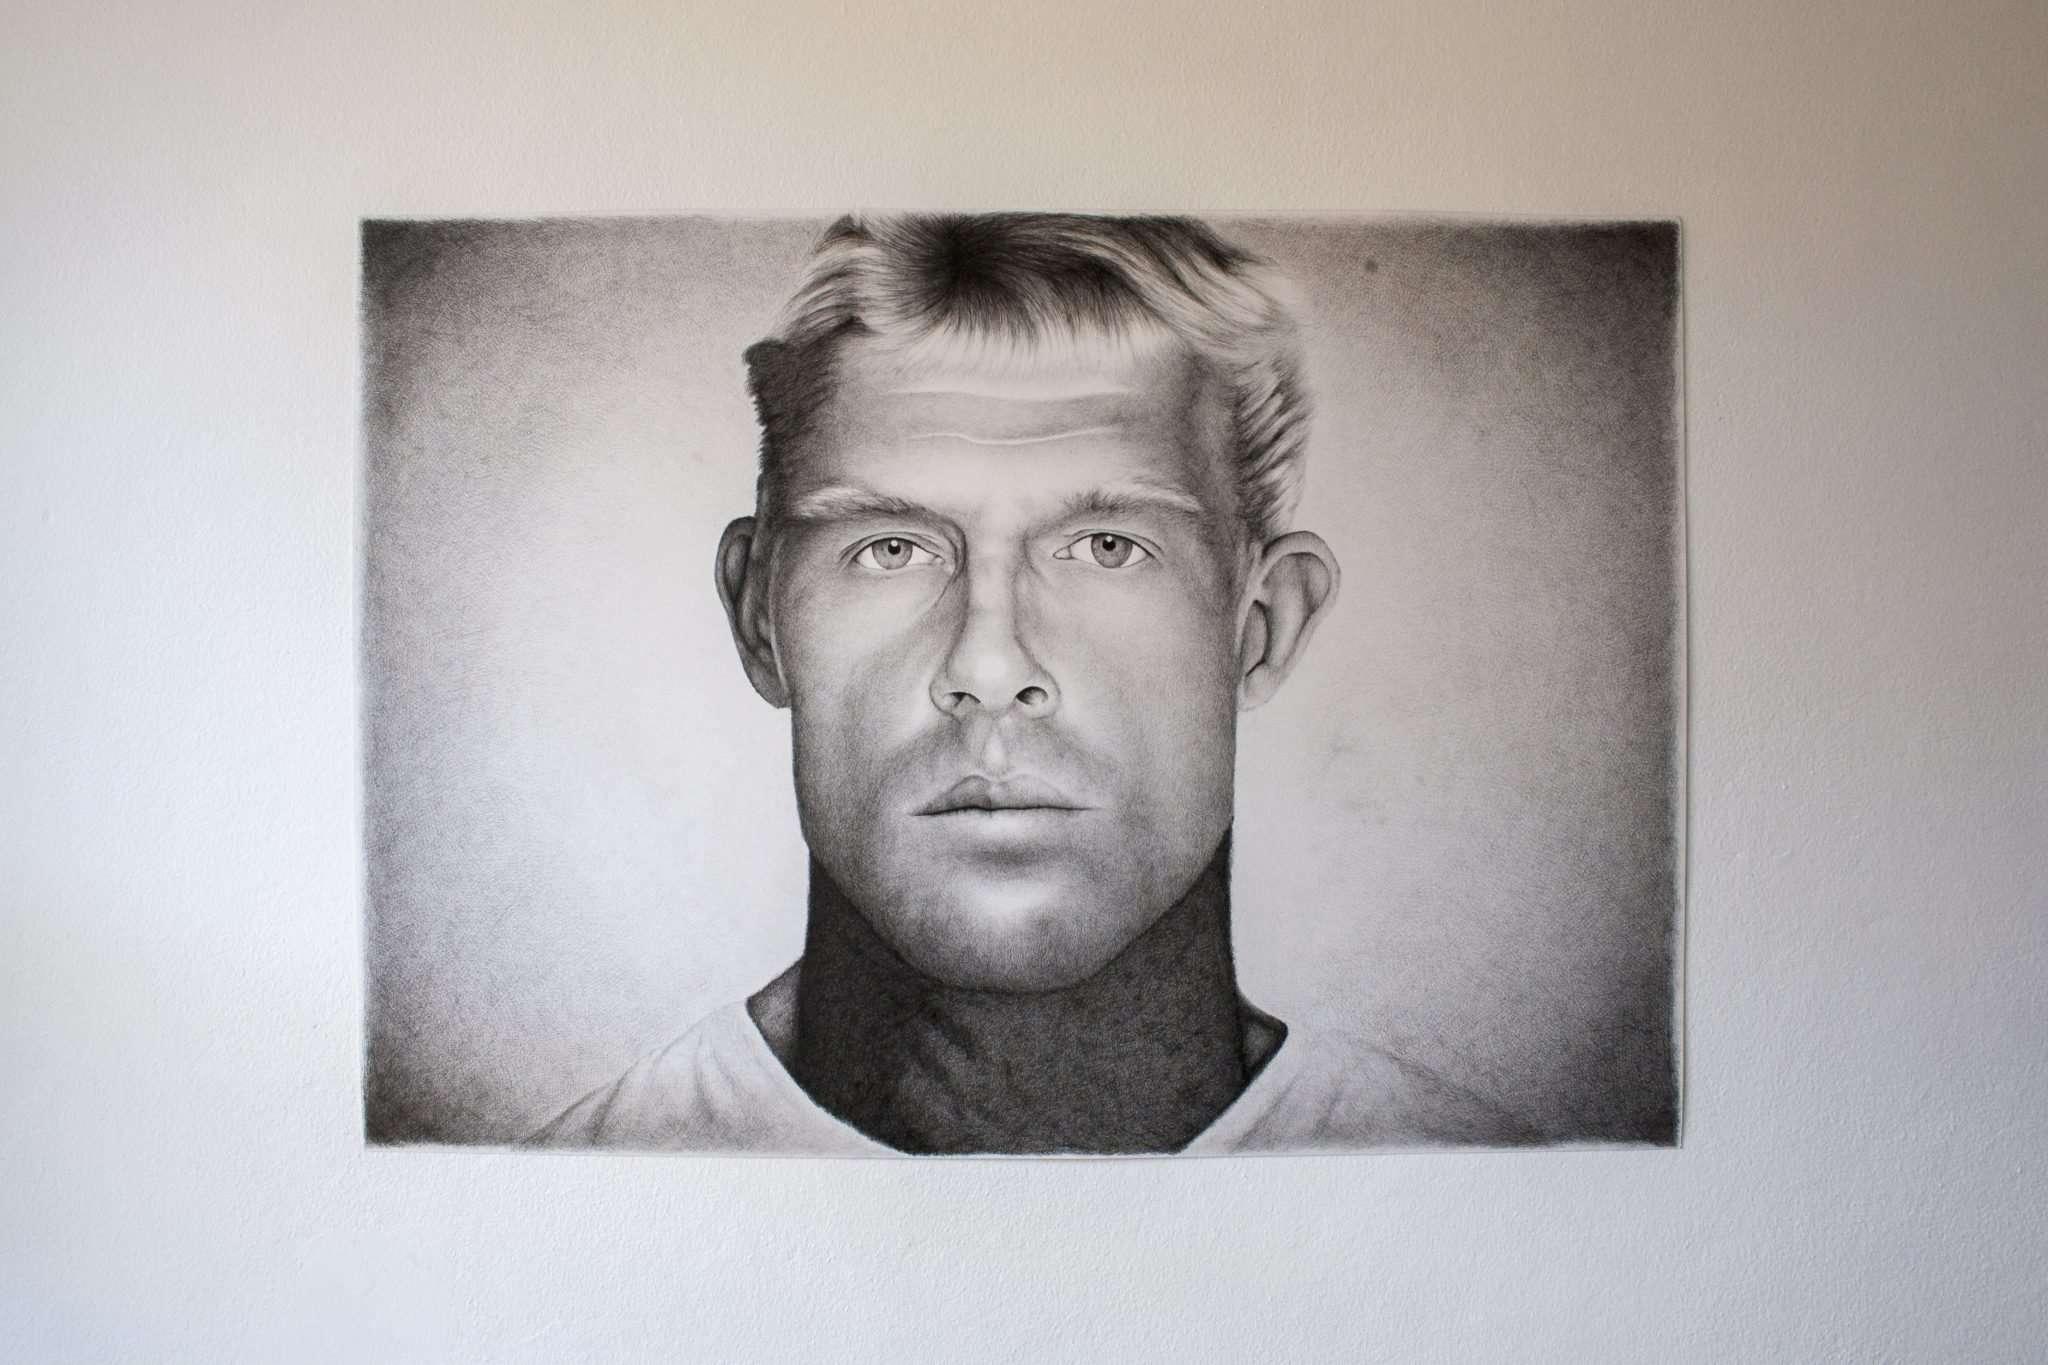 Mick Fanning portrait by artist Dean Spinks